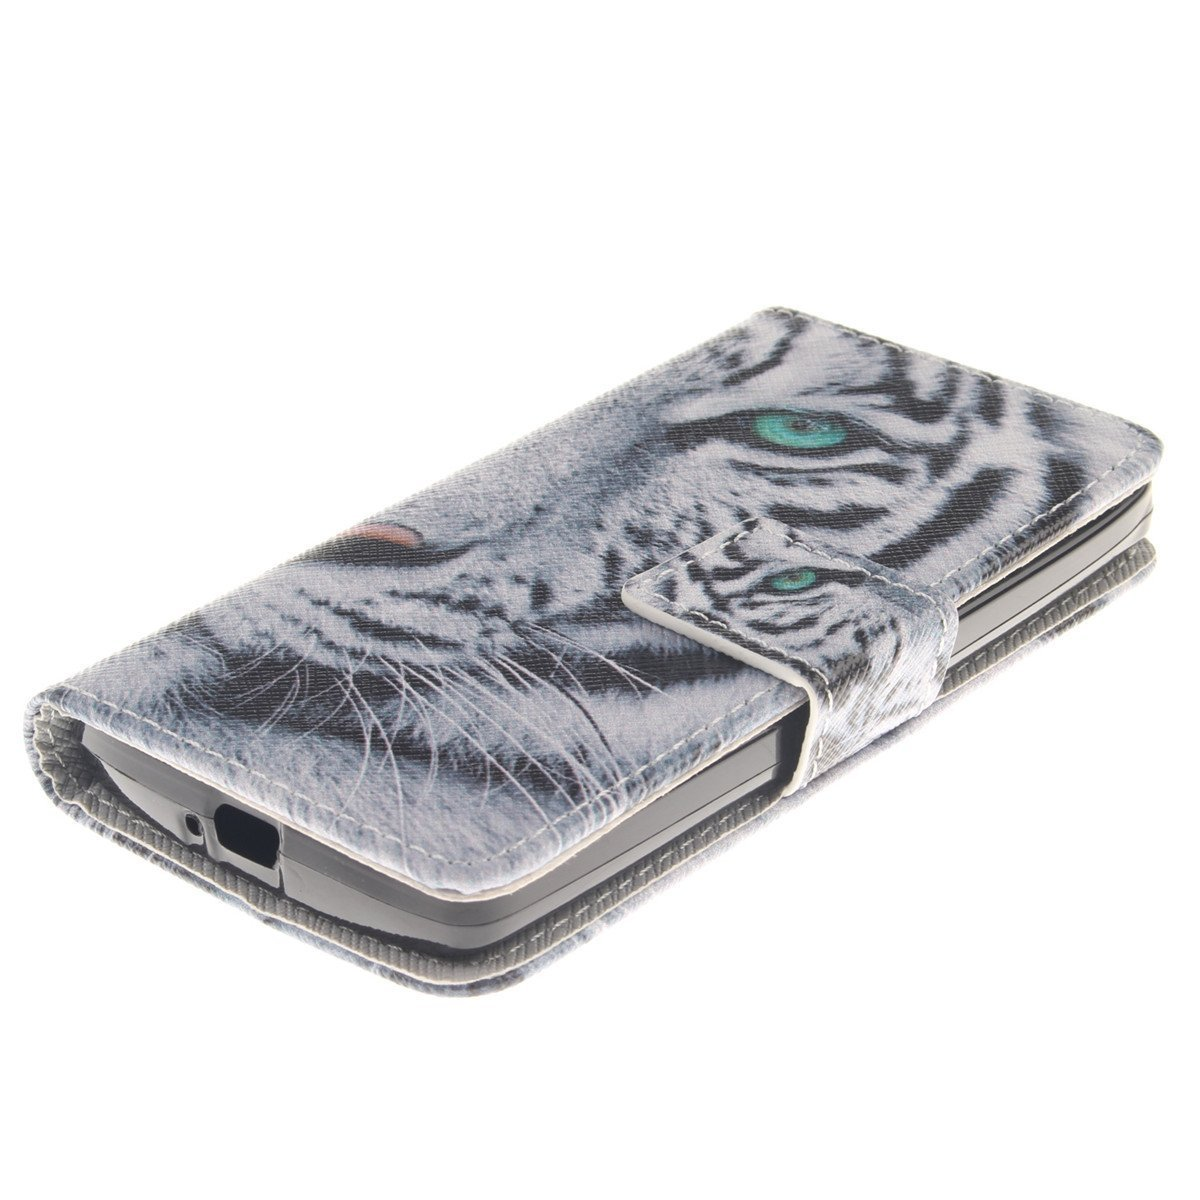 Amazon.com: LG Risio Case,LG Risio Wallet Leather Case,Robot ...